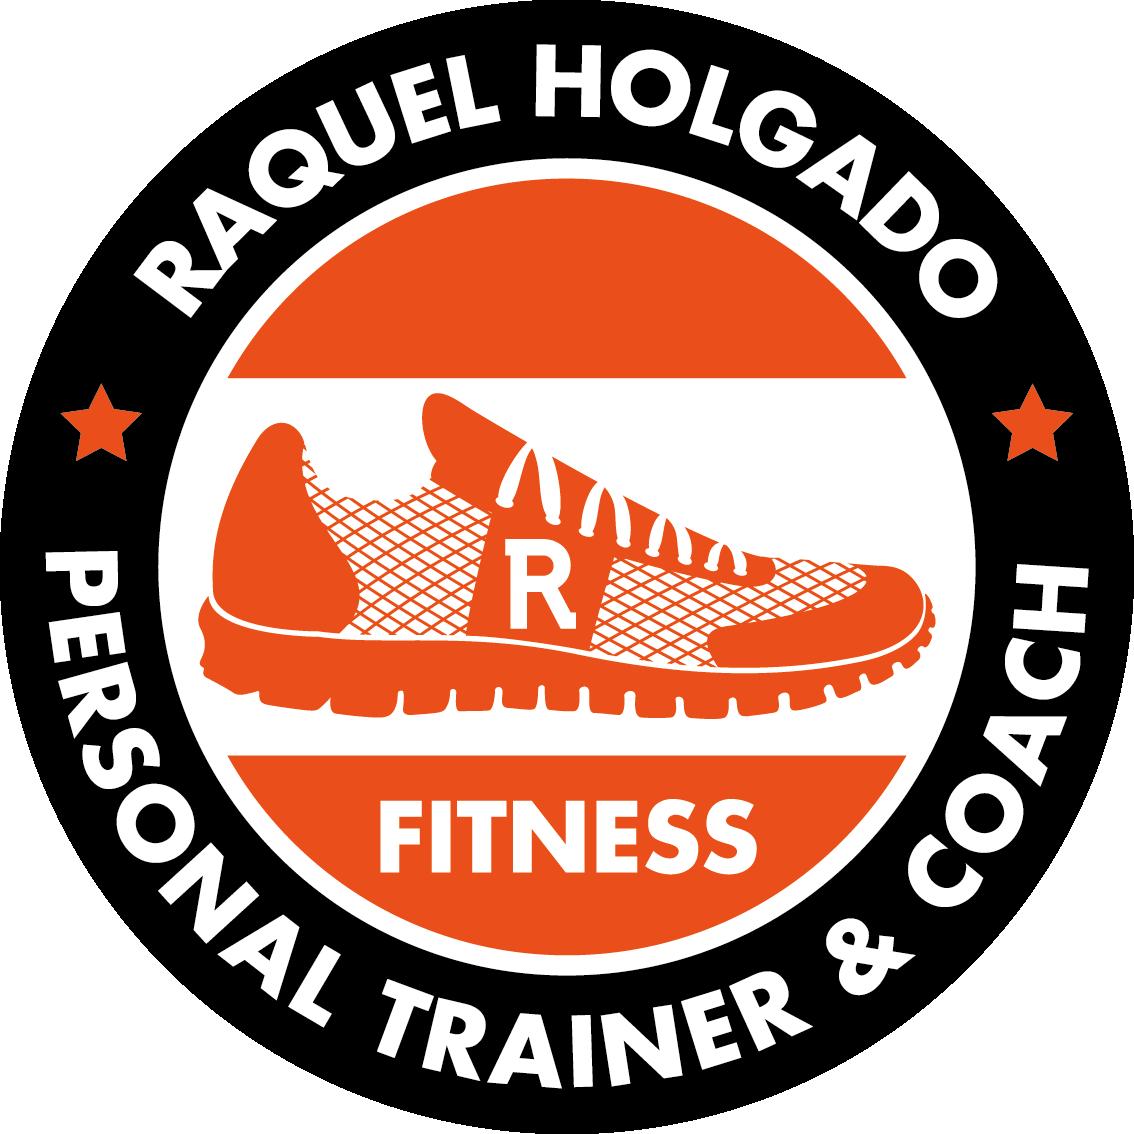 Raquel Holgado Fitness